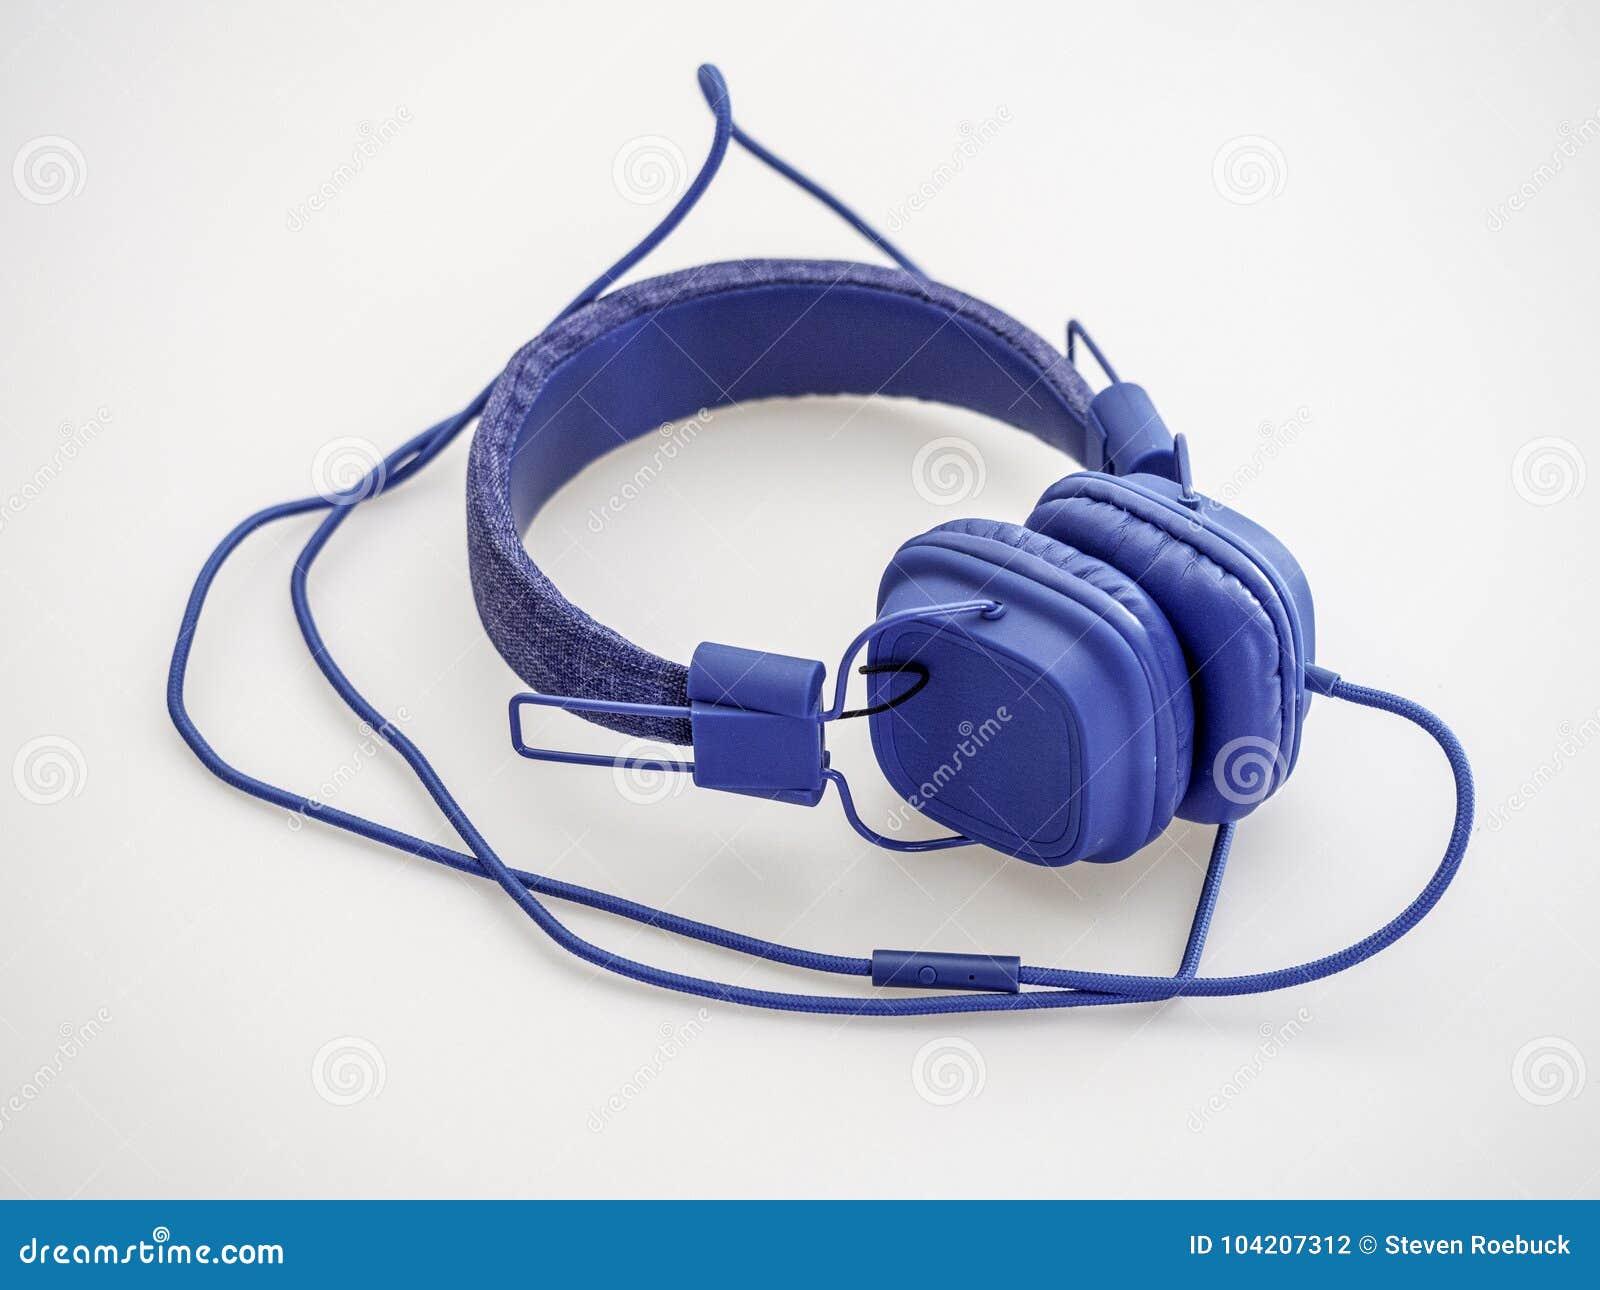 Blaue Kopfhörer mit blauem Kabel